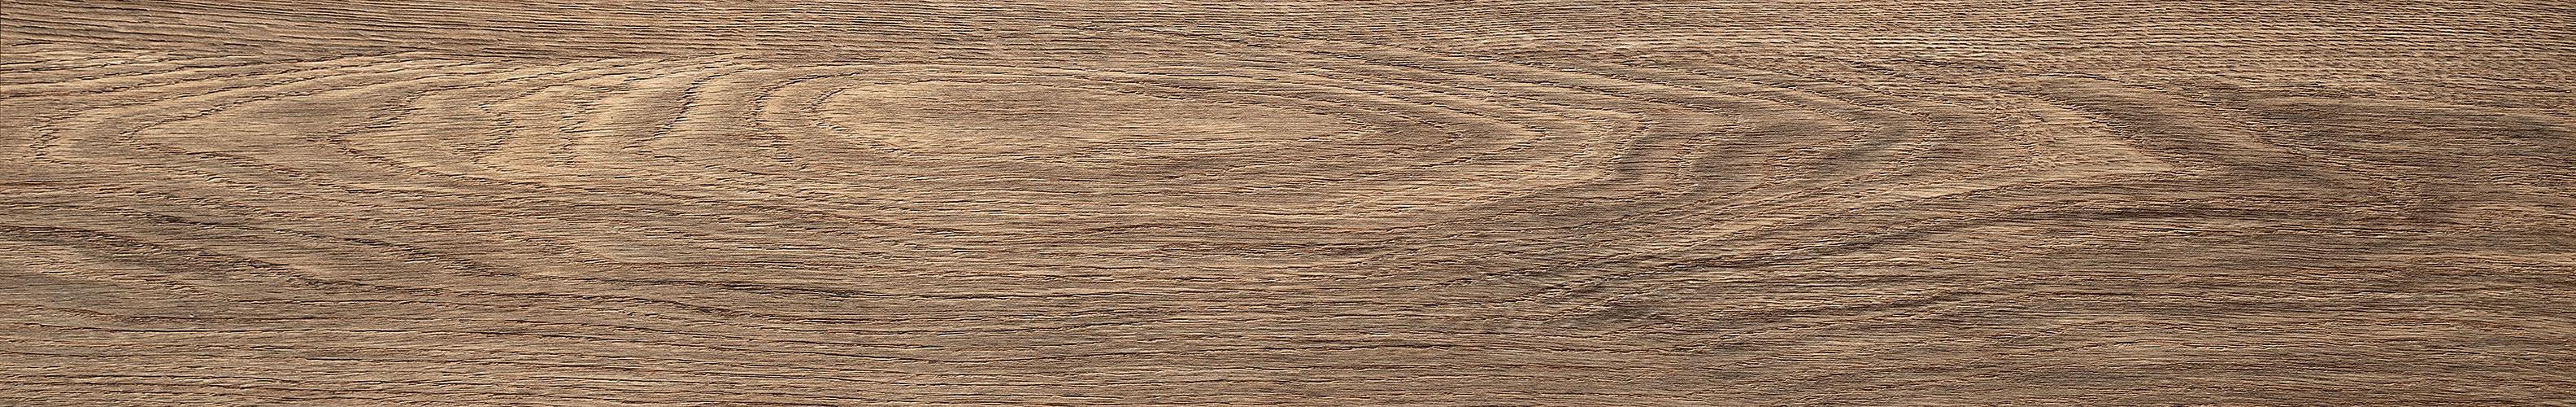 Marbel brown STR